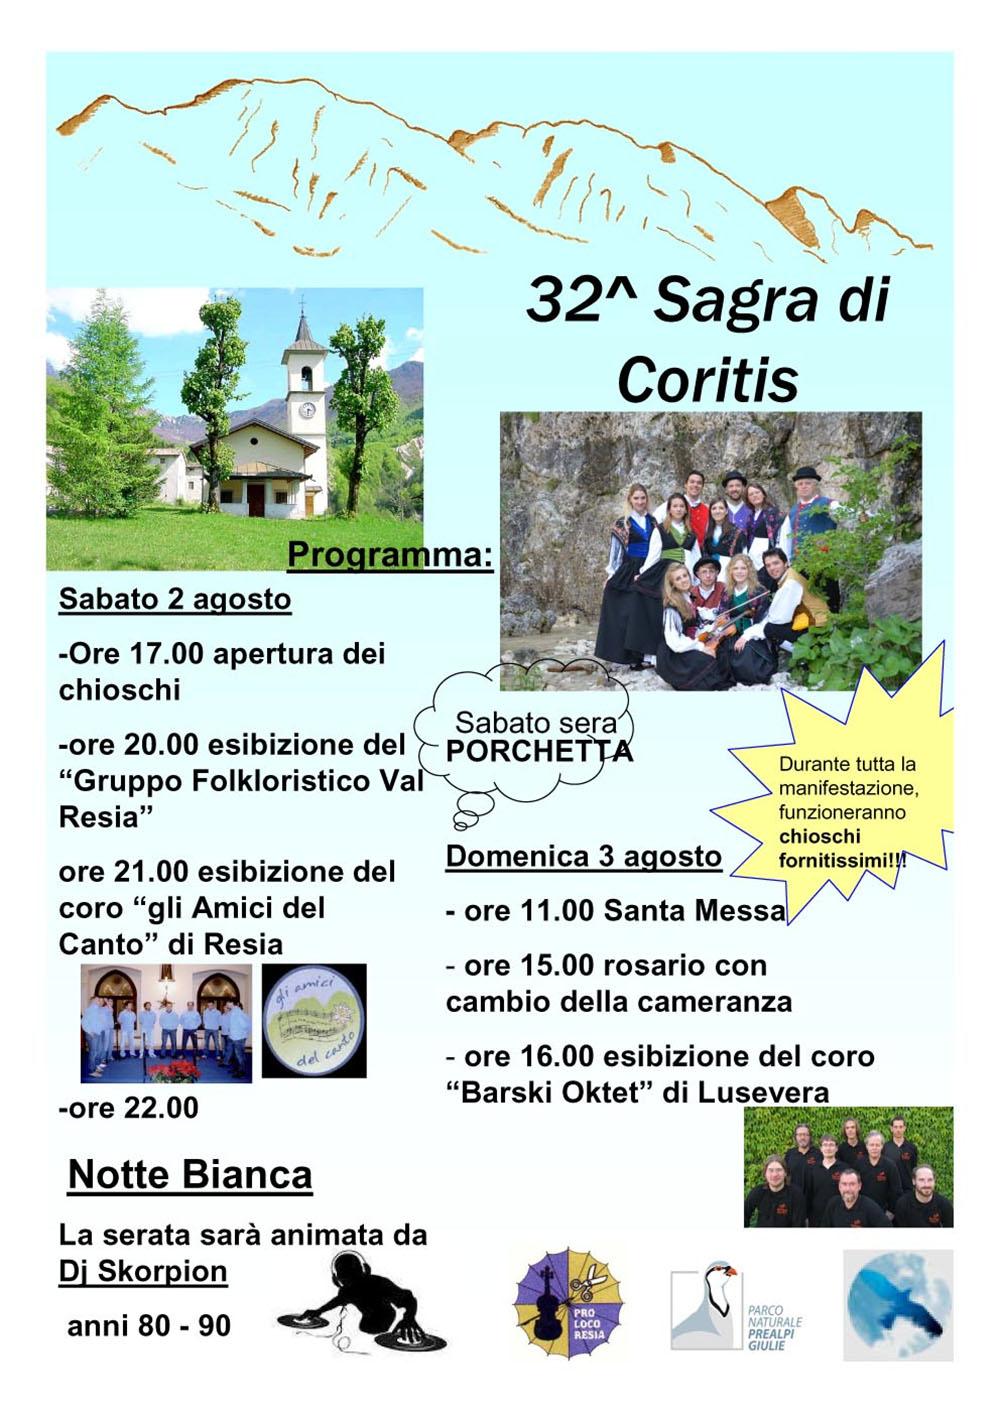 SagraCoritis2014